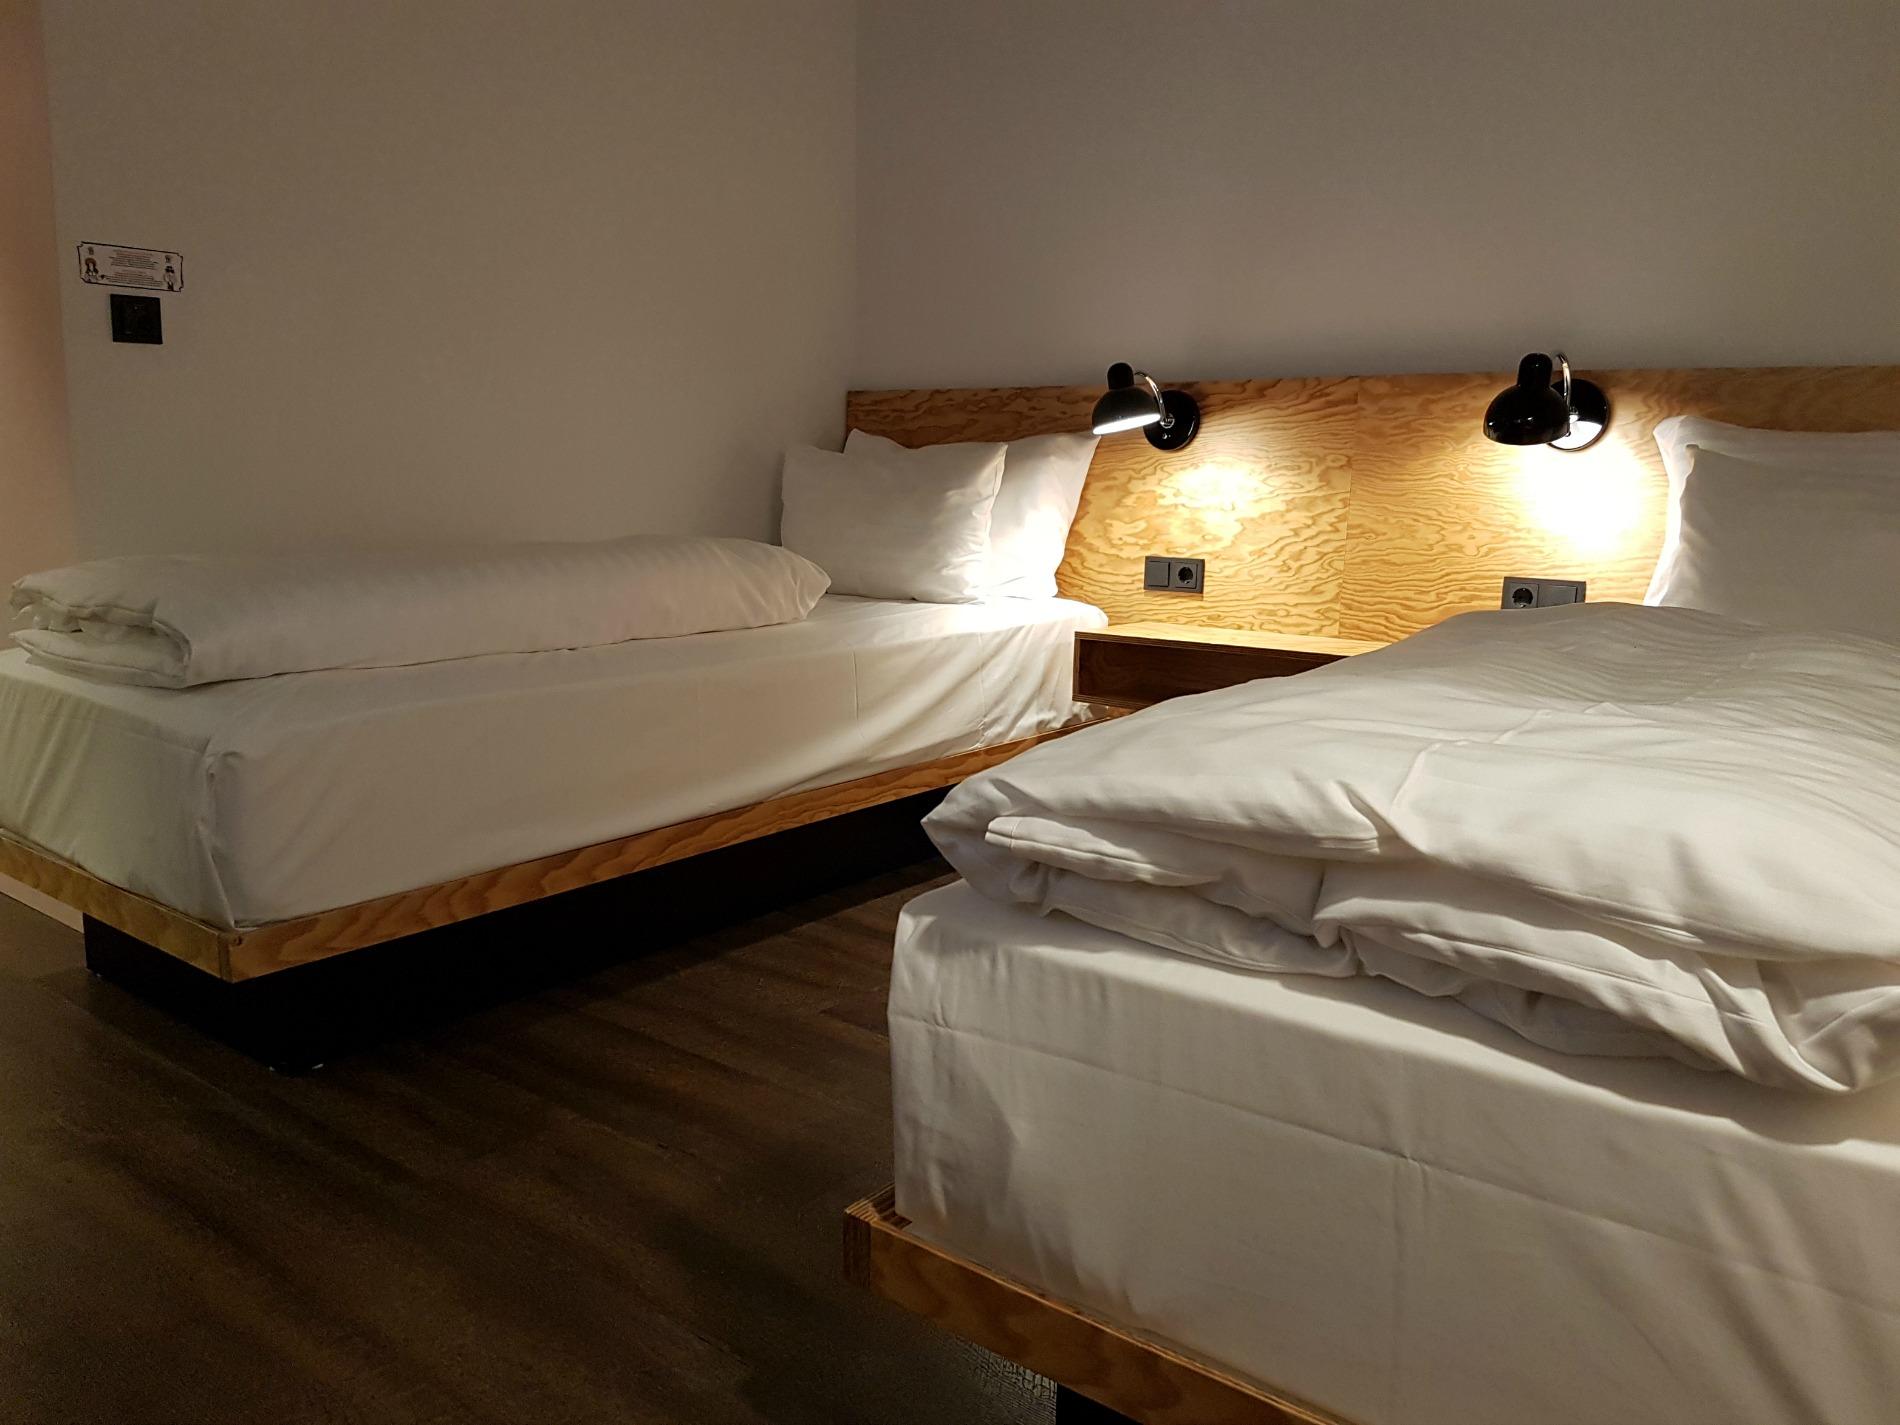 hotel-schani-wien-accessible-room-twin-bed